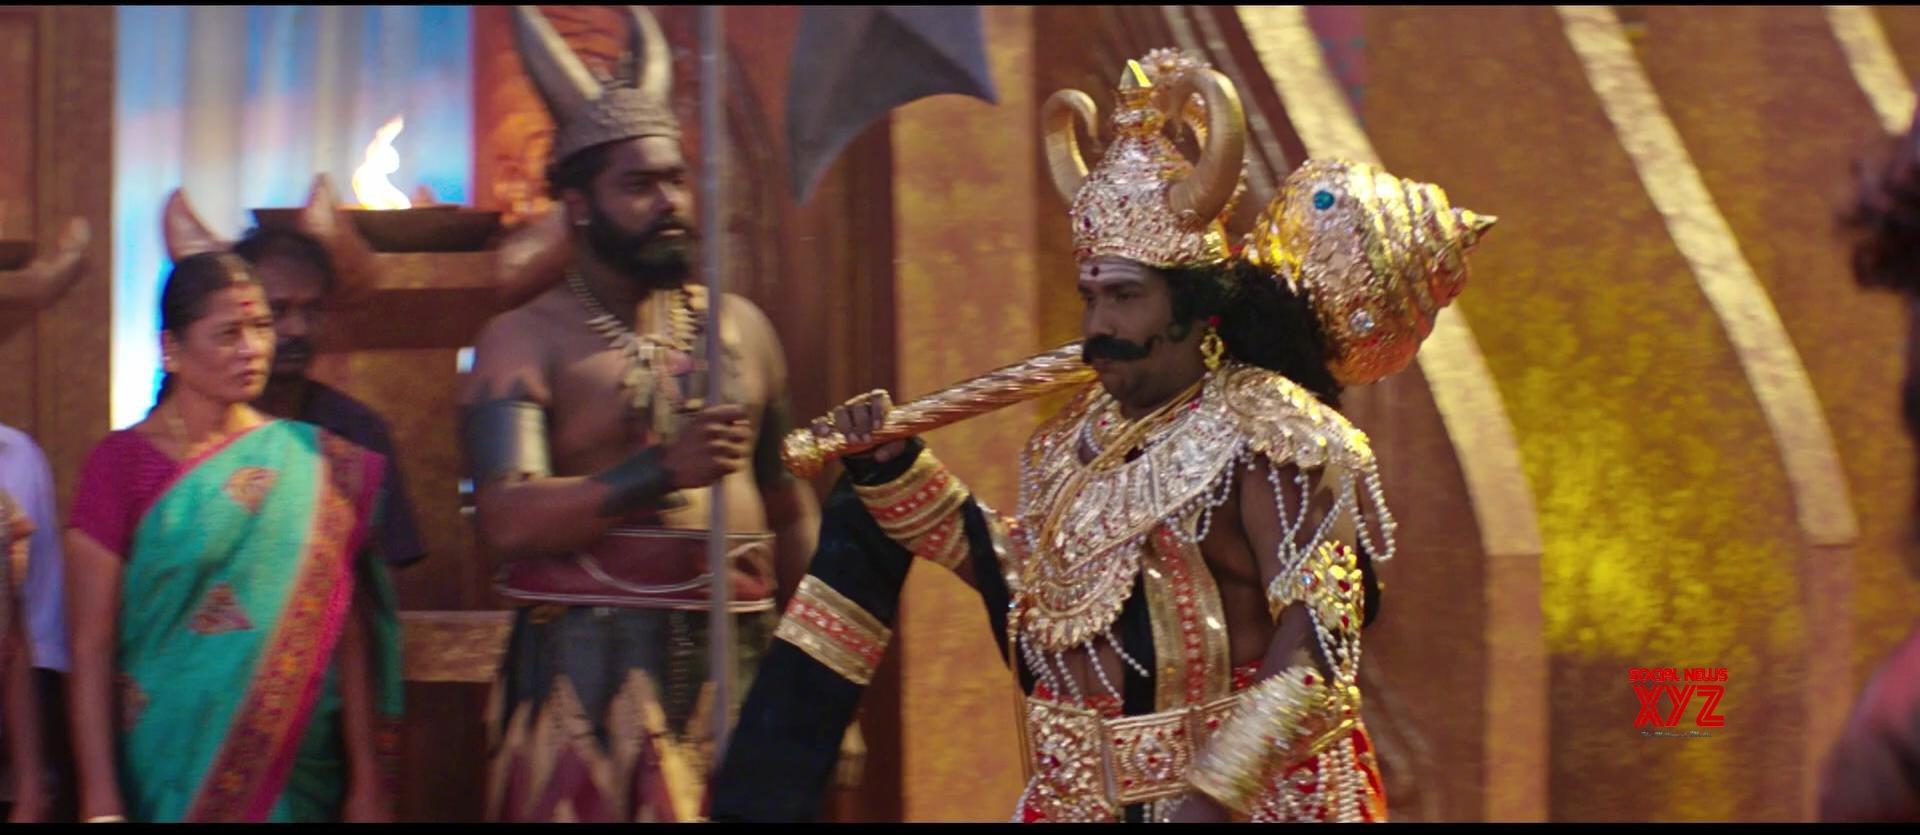 Yogi Babu's Dharmaprabhu Movie Teaser Stills - Social News XYZ